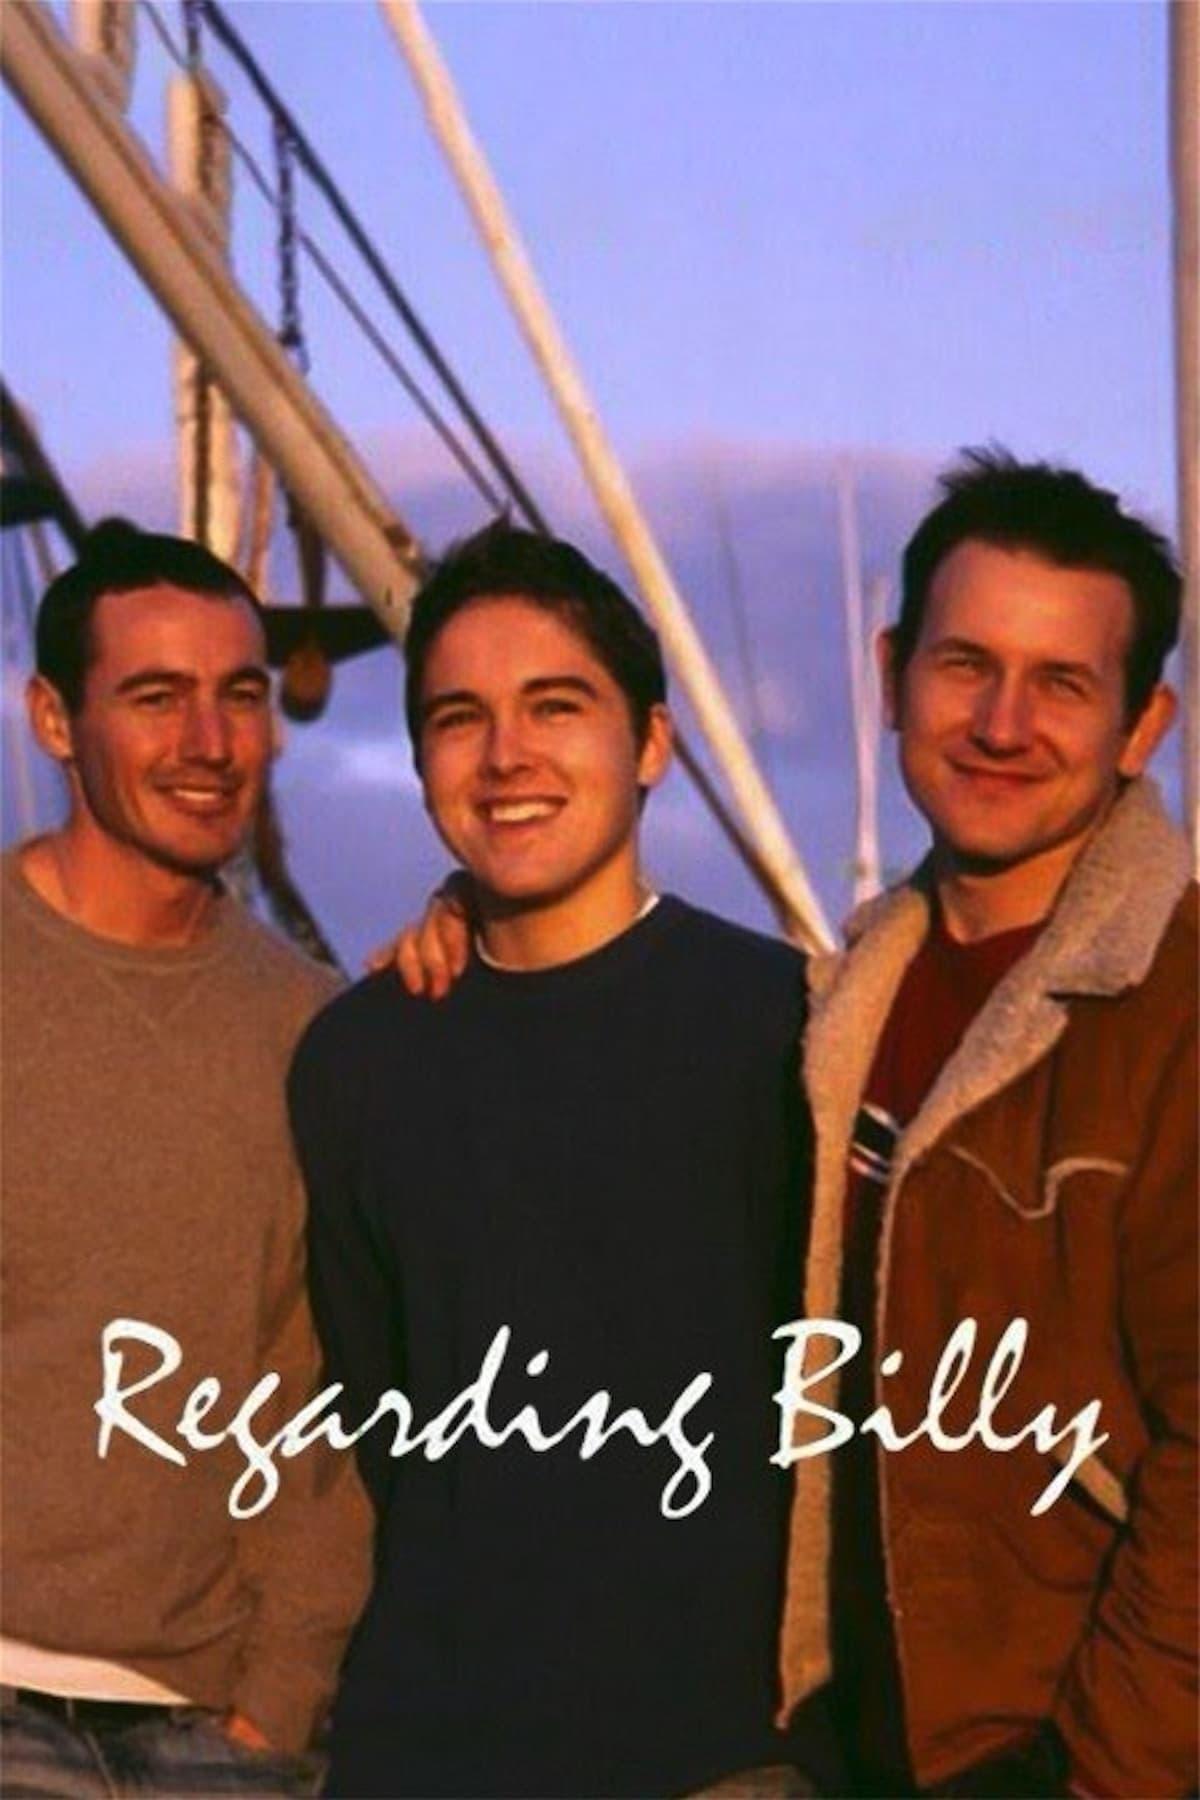 Regarding Billy